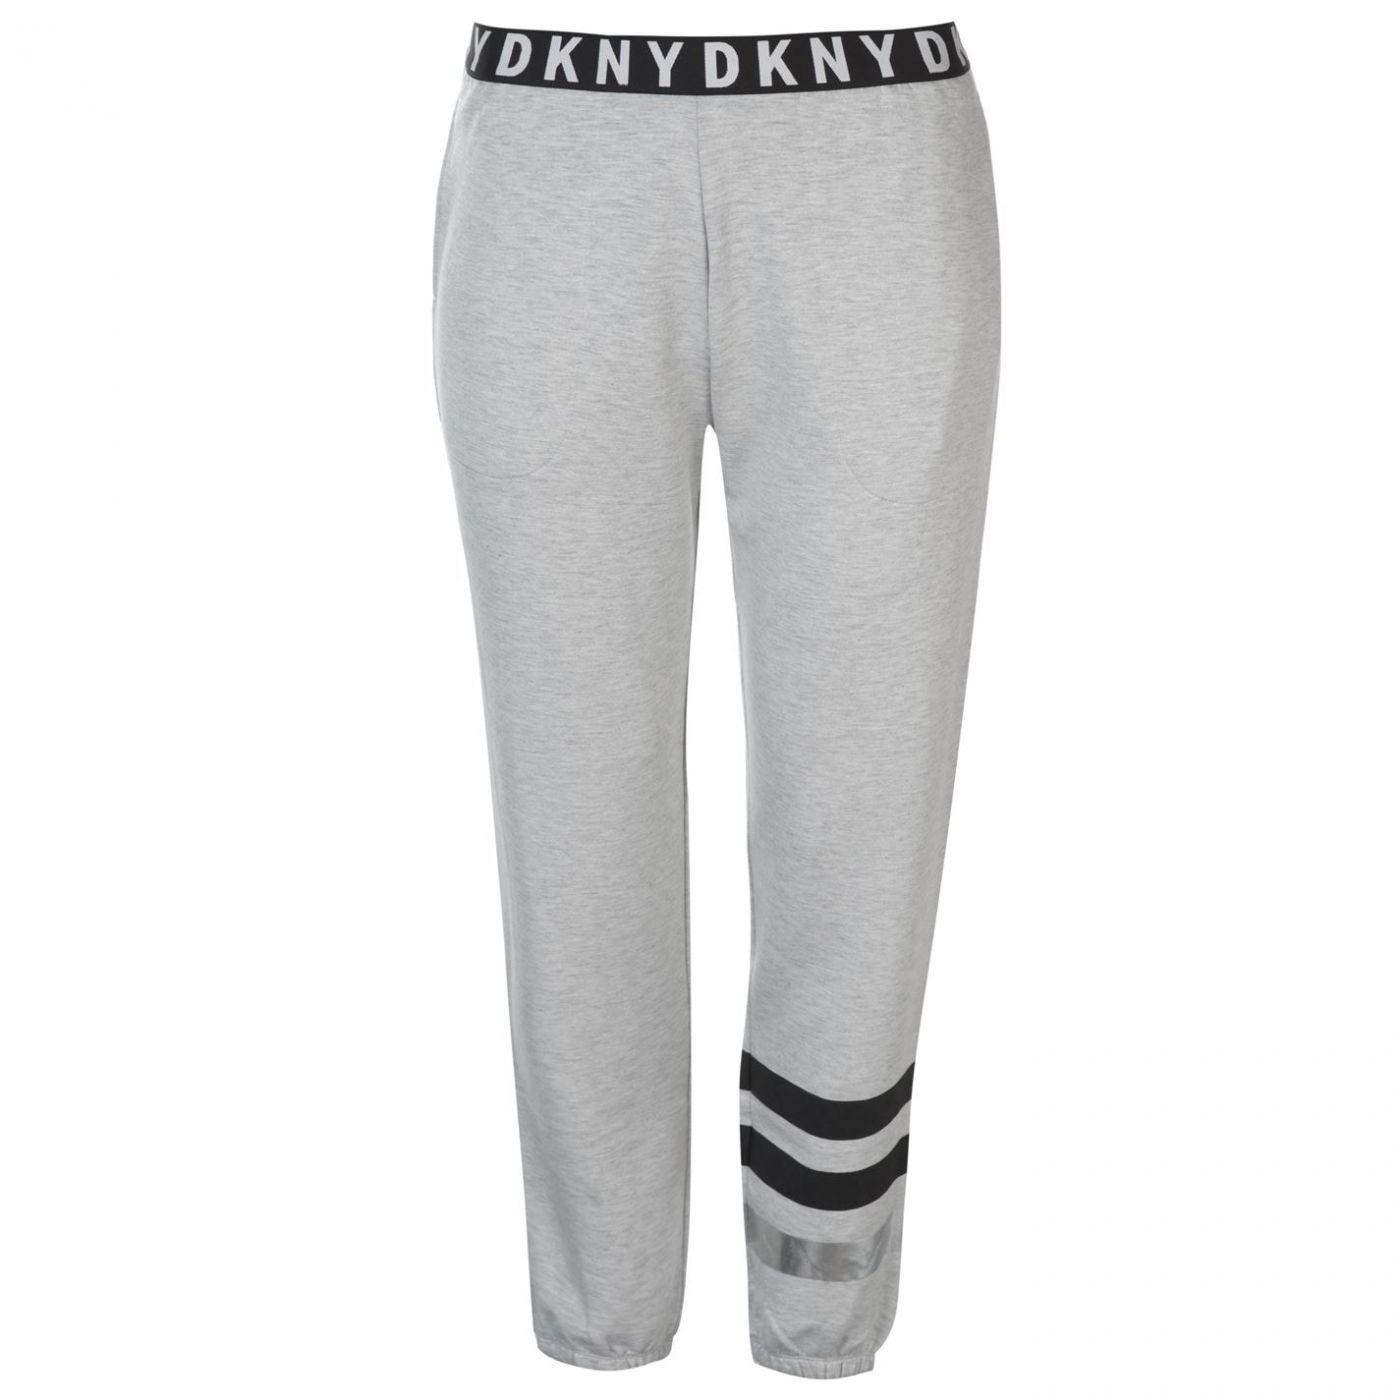 DKNY Ankle Stripe Pyjama Bottoms Ladies